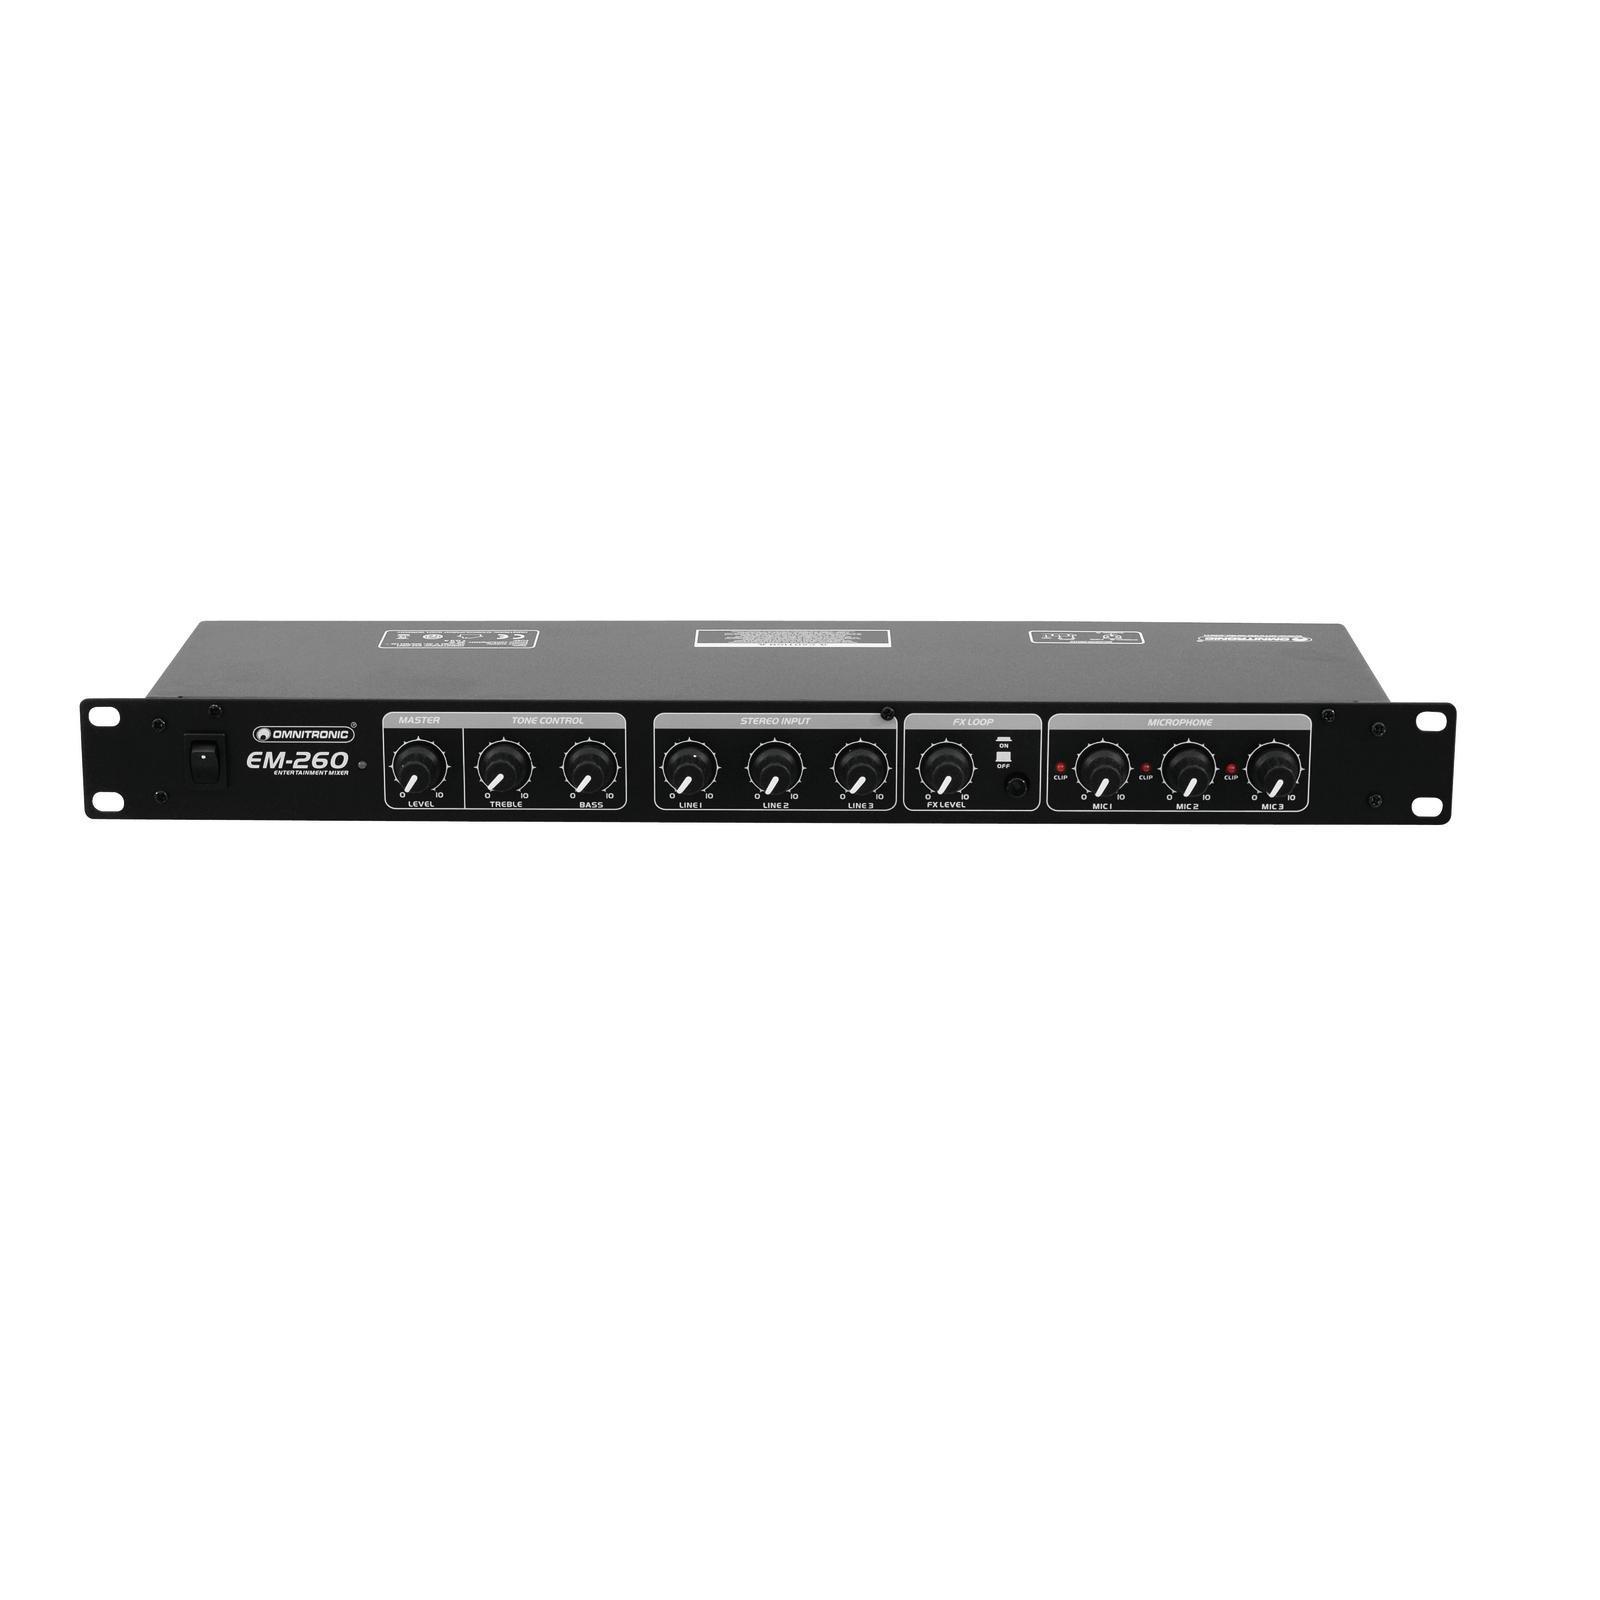 OMNITRONIC EM-260B Entertainment Mixer